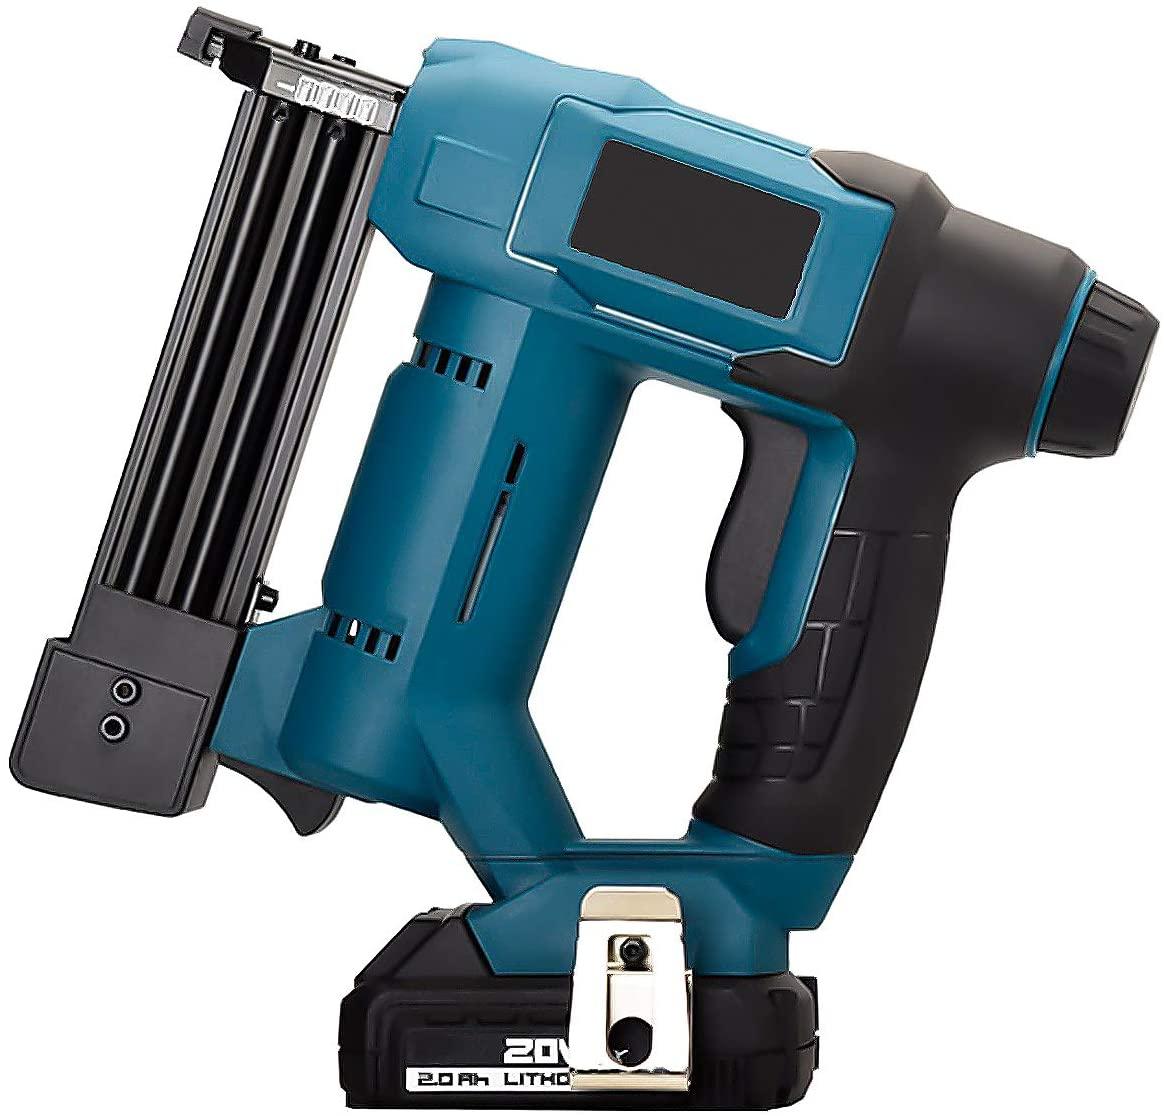 Electric nail gun Cordless Electric Gun Rechargeable Lithium Battery F30 / K425 Gas Nail Gun Hardware Upholstery Tools Fastening Hardware Decoration Carpentry Furniture